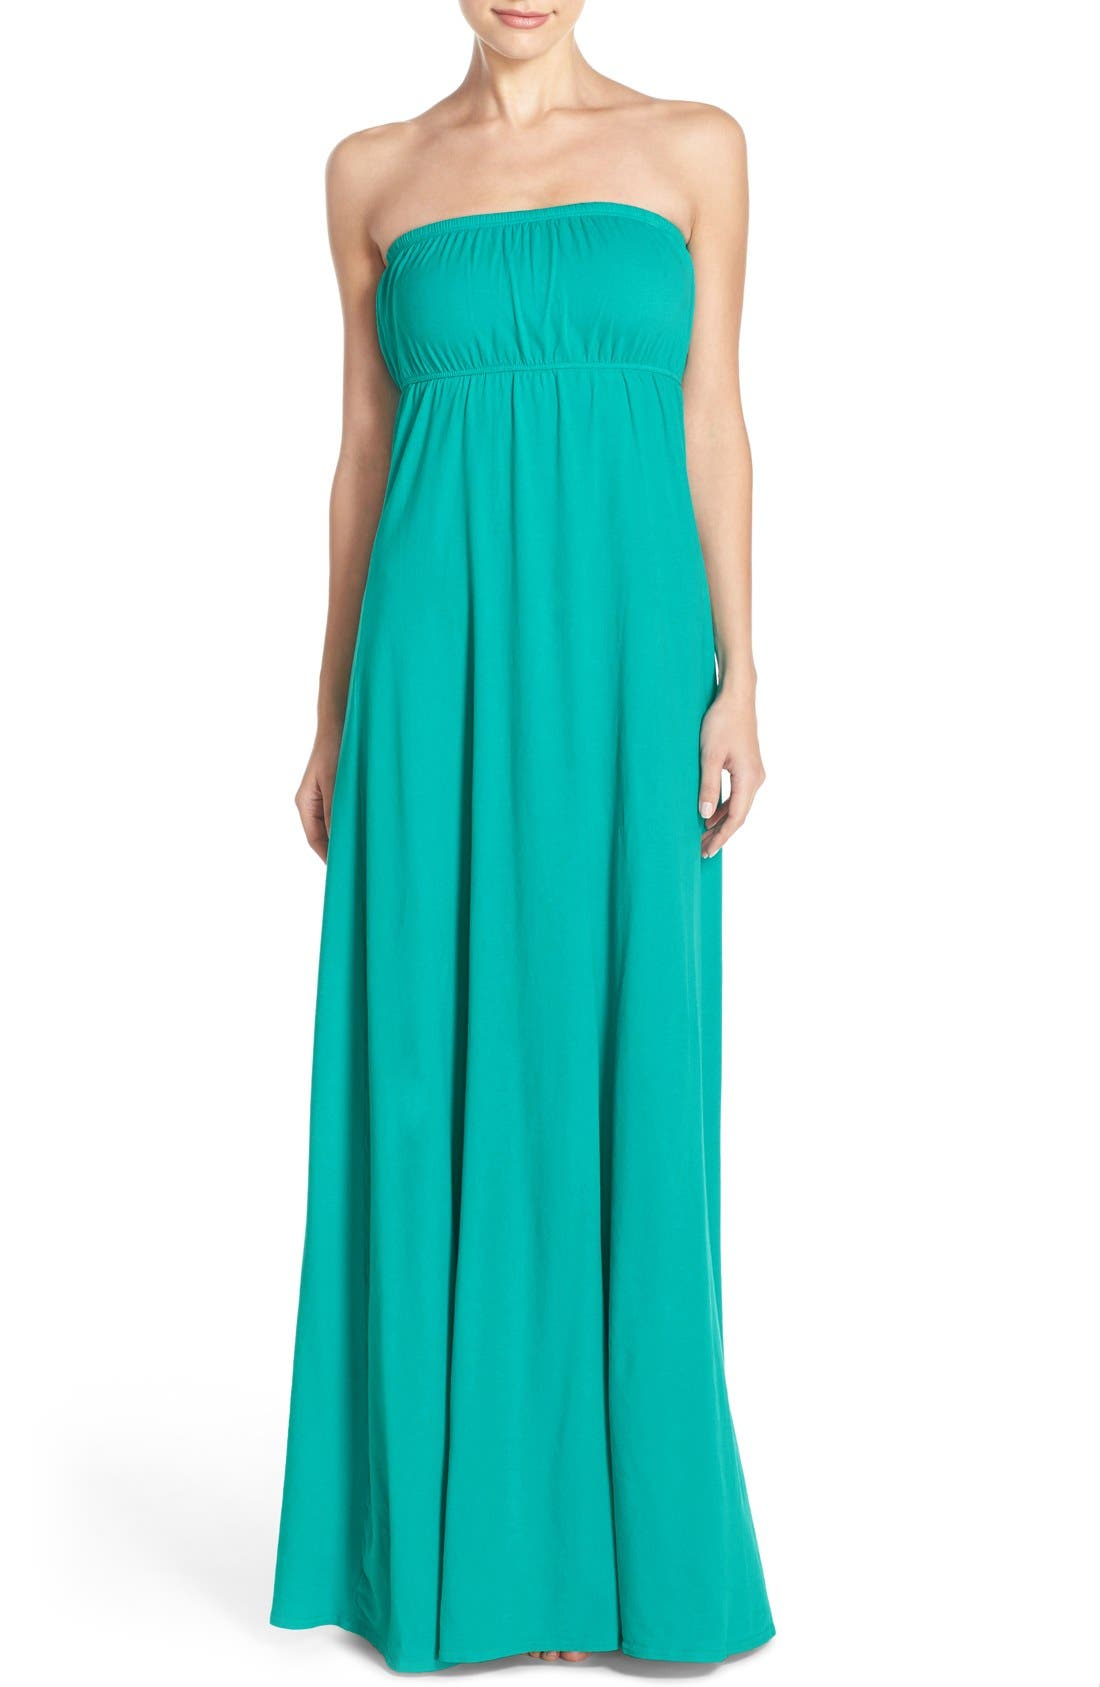 Alternate Image 1 Selected - Hard Tail Long Strapless Dress